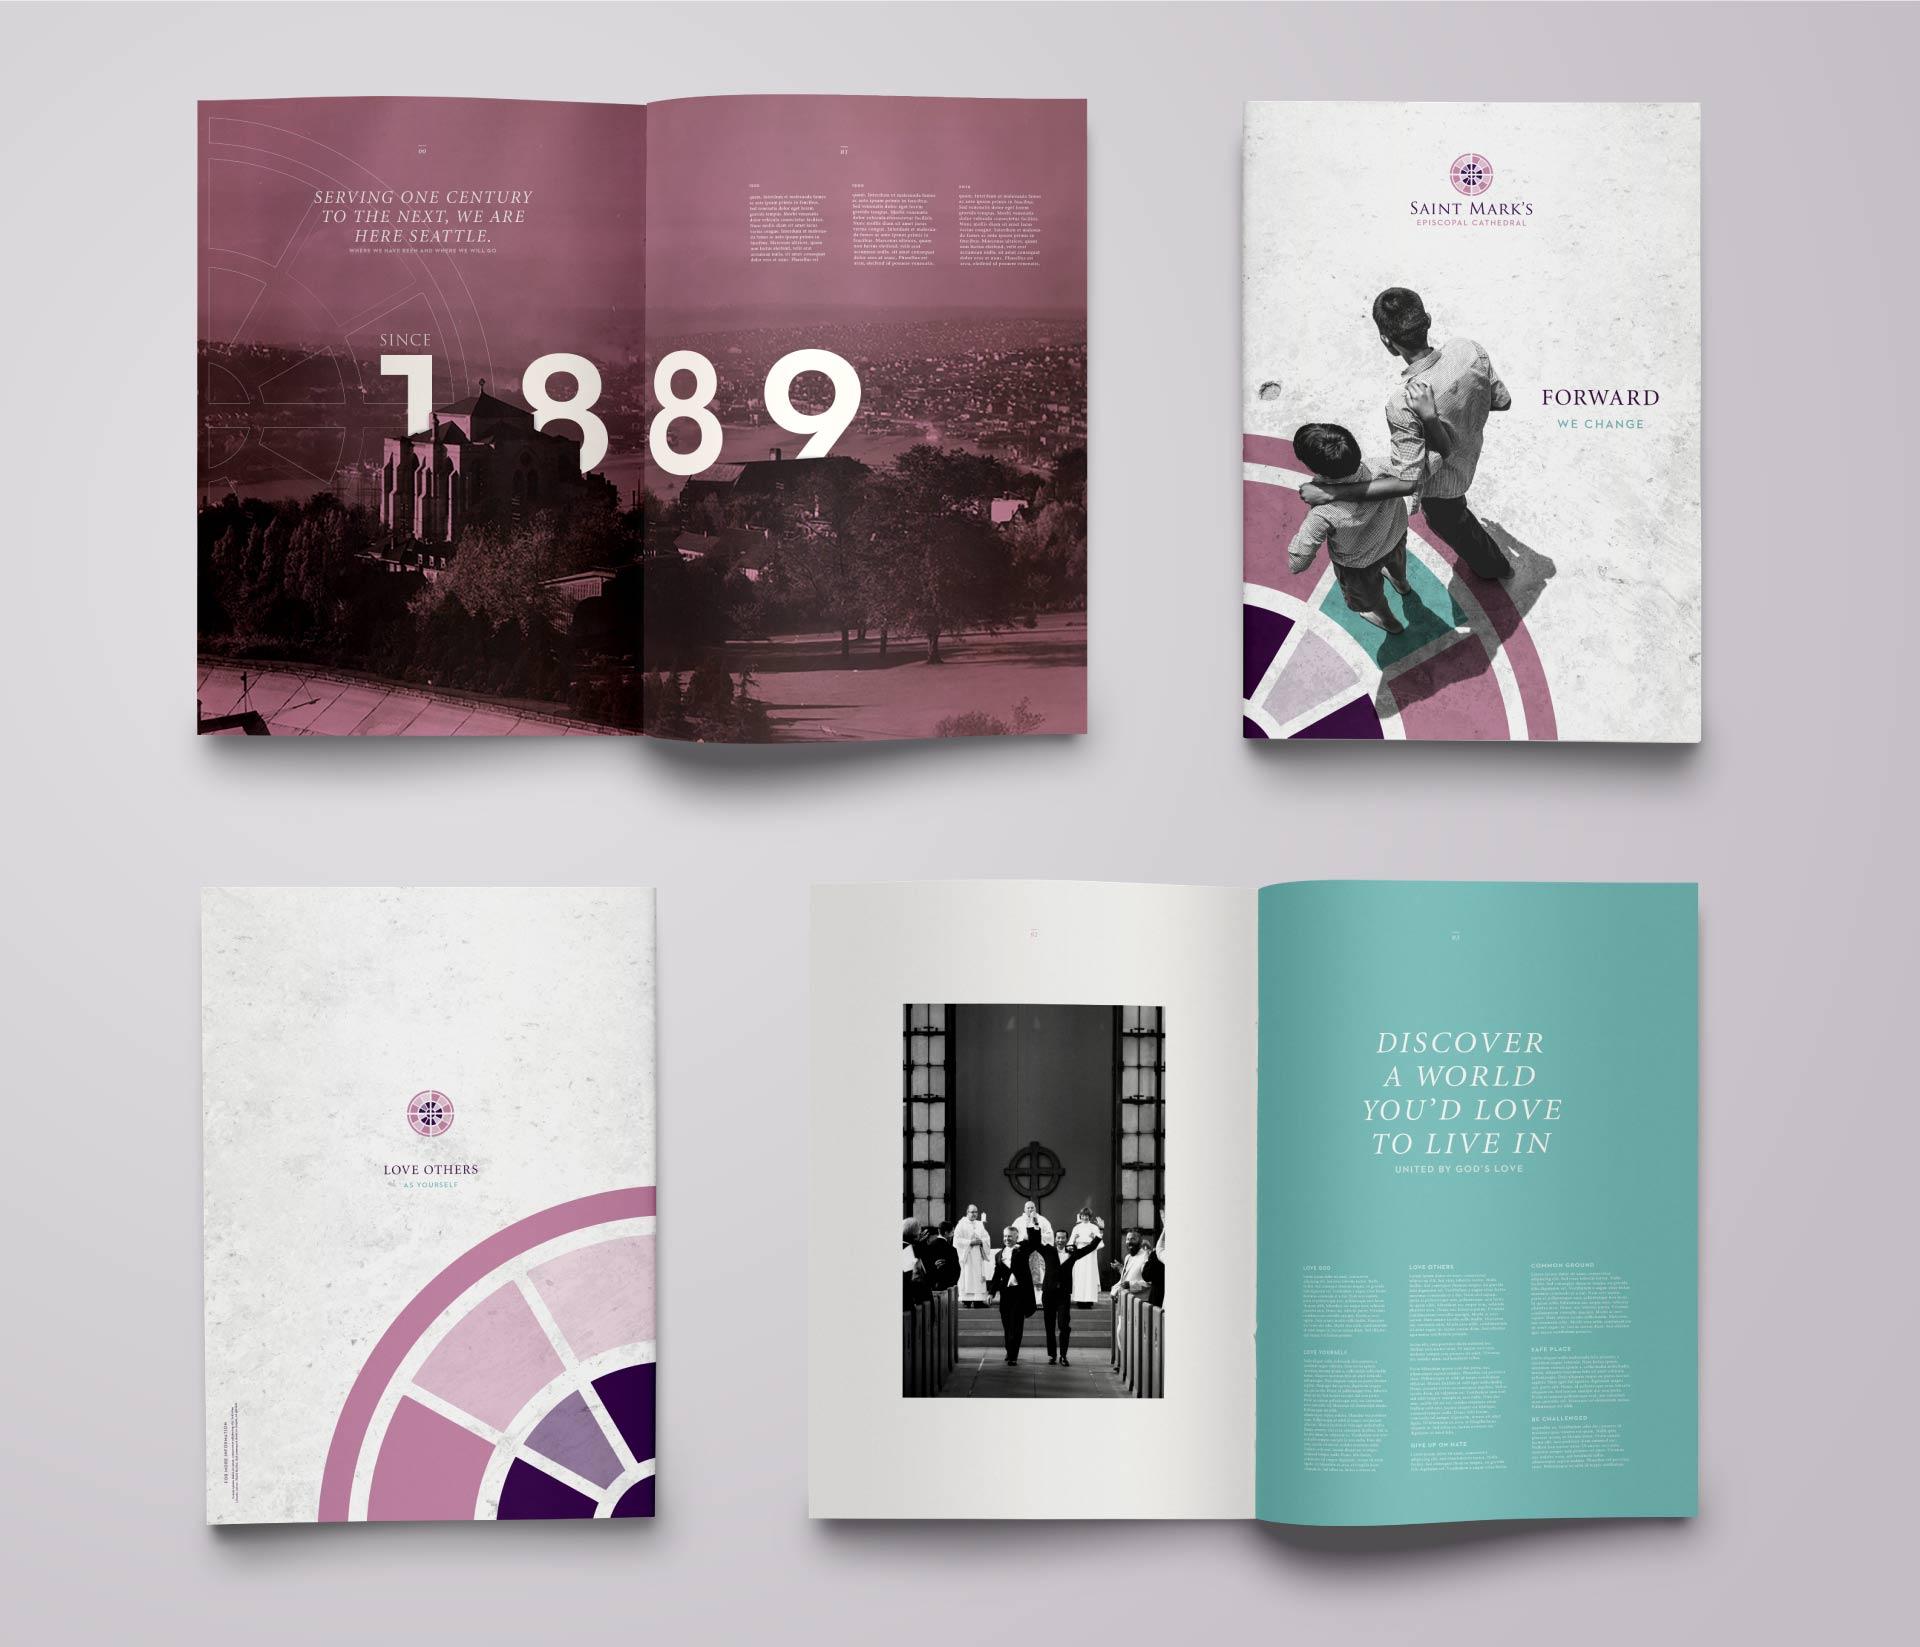 Creative_Retail_Packaging_Saint_Marks_Episcopal_Cathedral_Branding_Identity_6.jpg